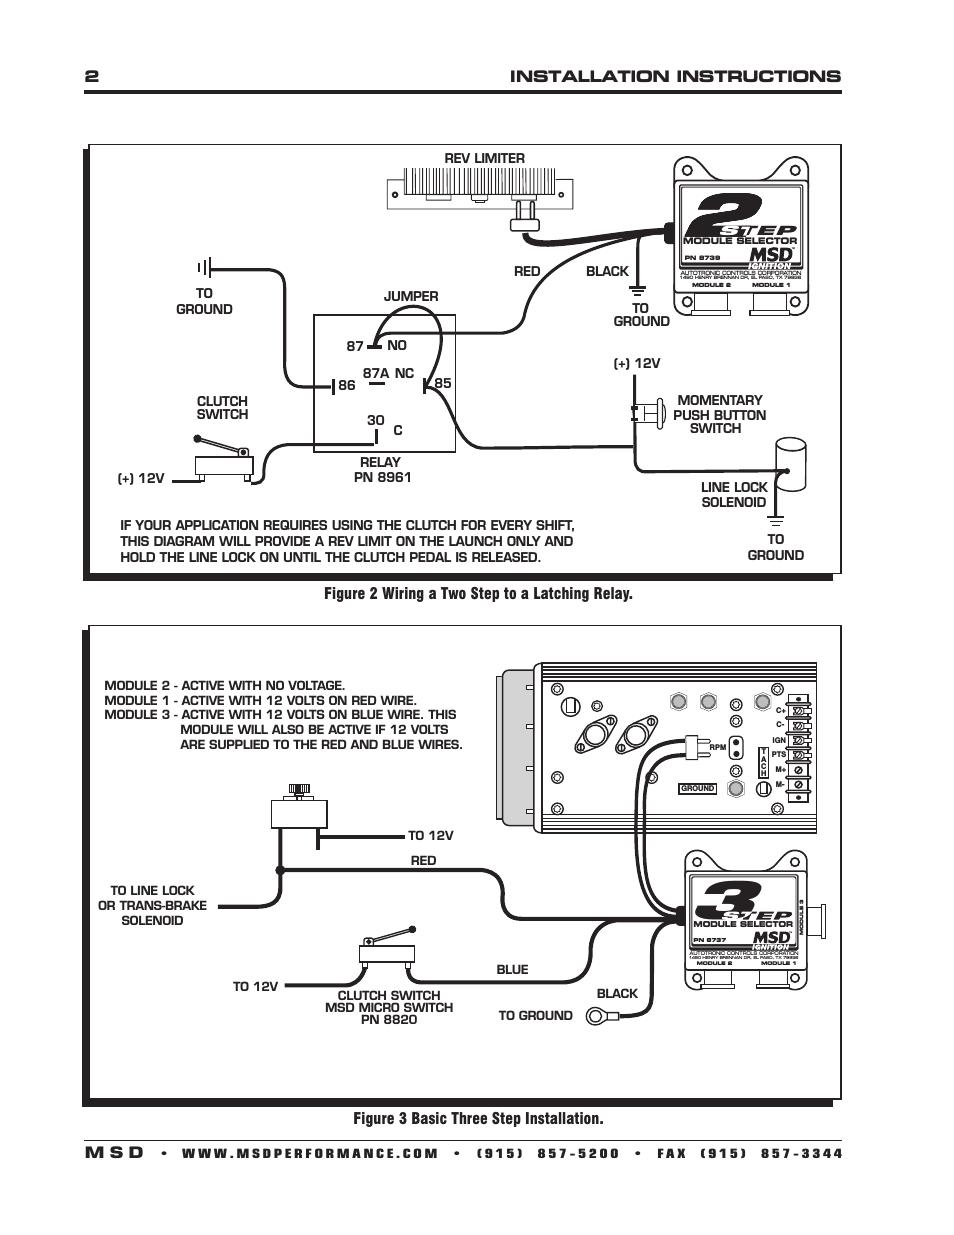 msd 2 step wiring diagram wiring diagram fascinating msd 3 step wiring diagram msd 2 step